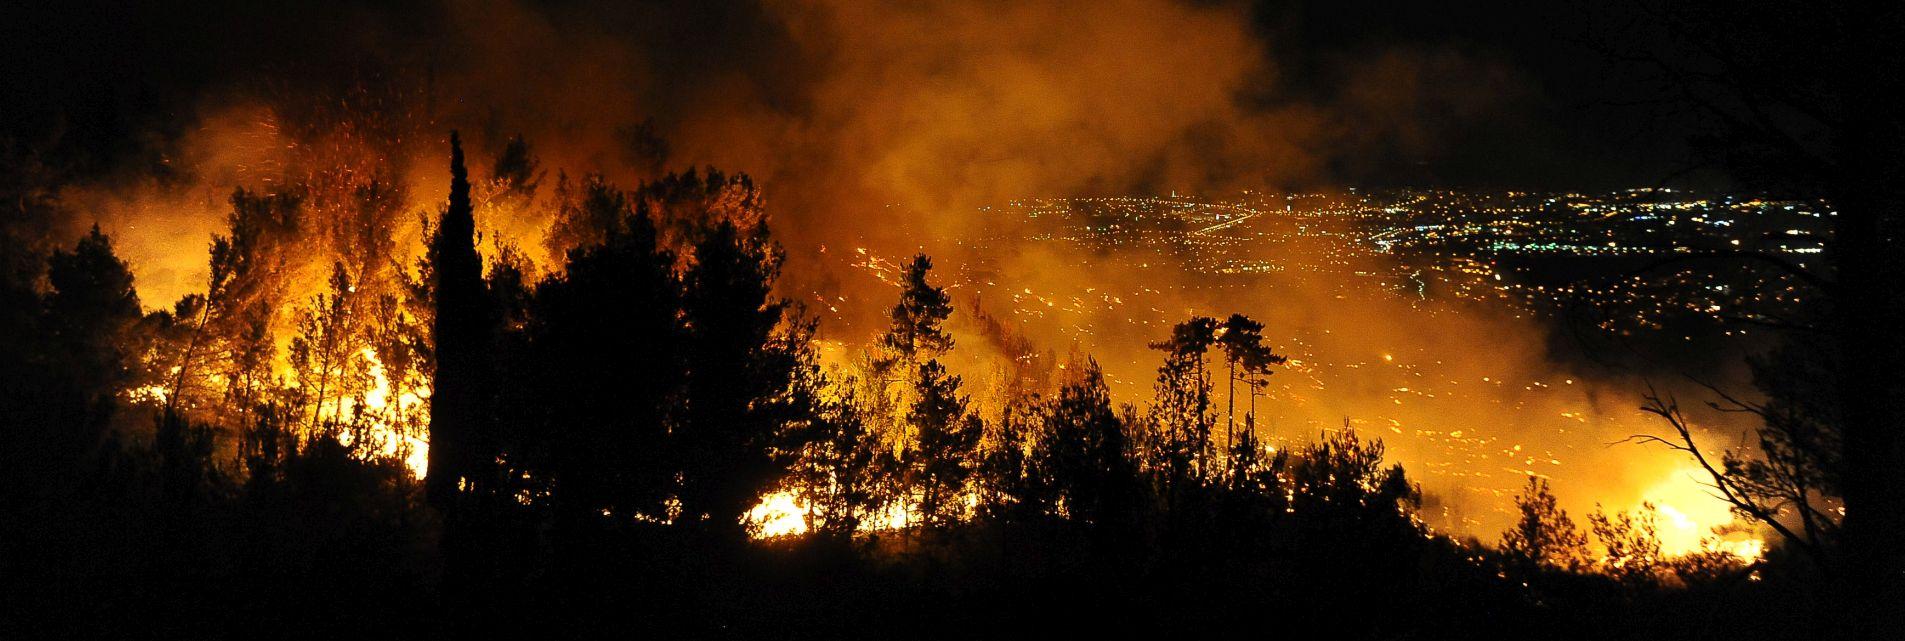 VIDEO: NEMILOSRDNA VATRA Tisuću portugalskih vatrogasaca u borbi s valom novih požara